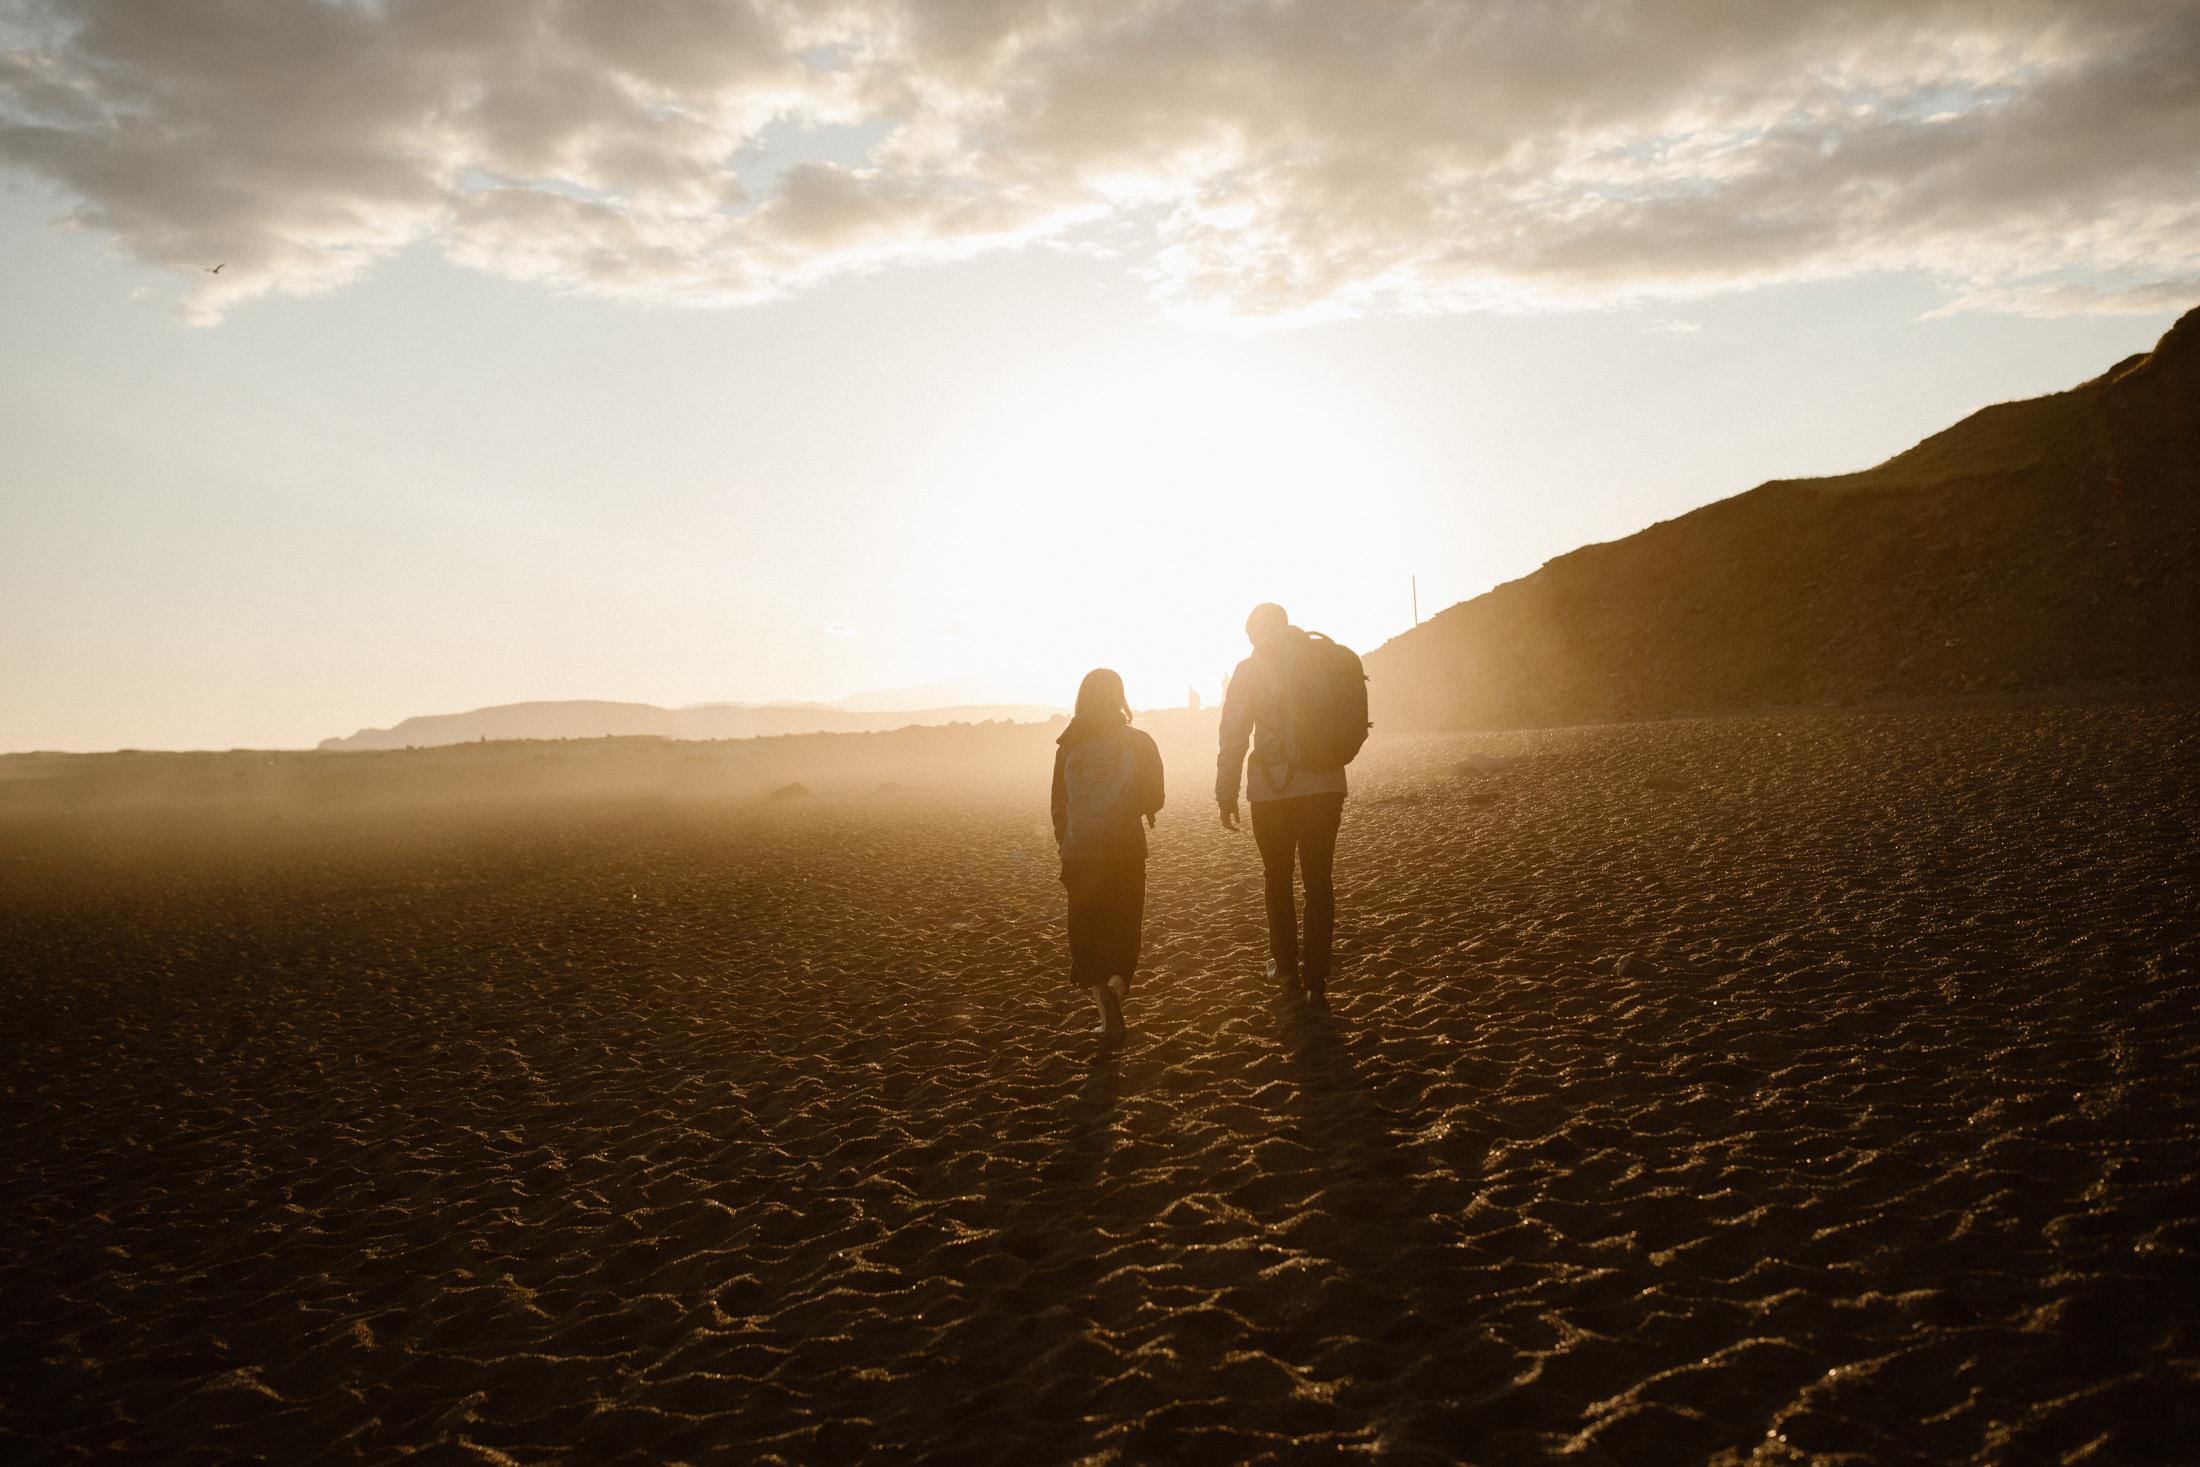 reynisfjara-black-sand-beach-photography-in-icleand-45.jpg